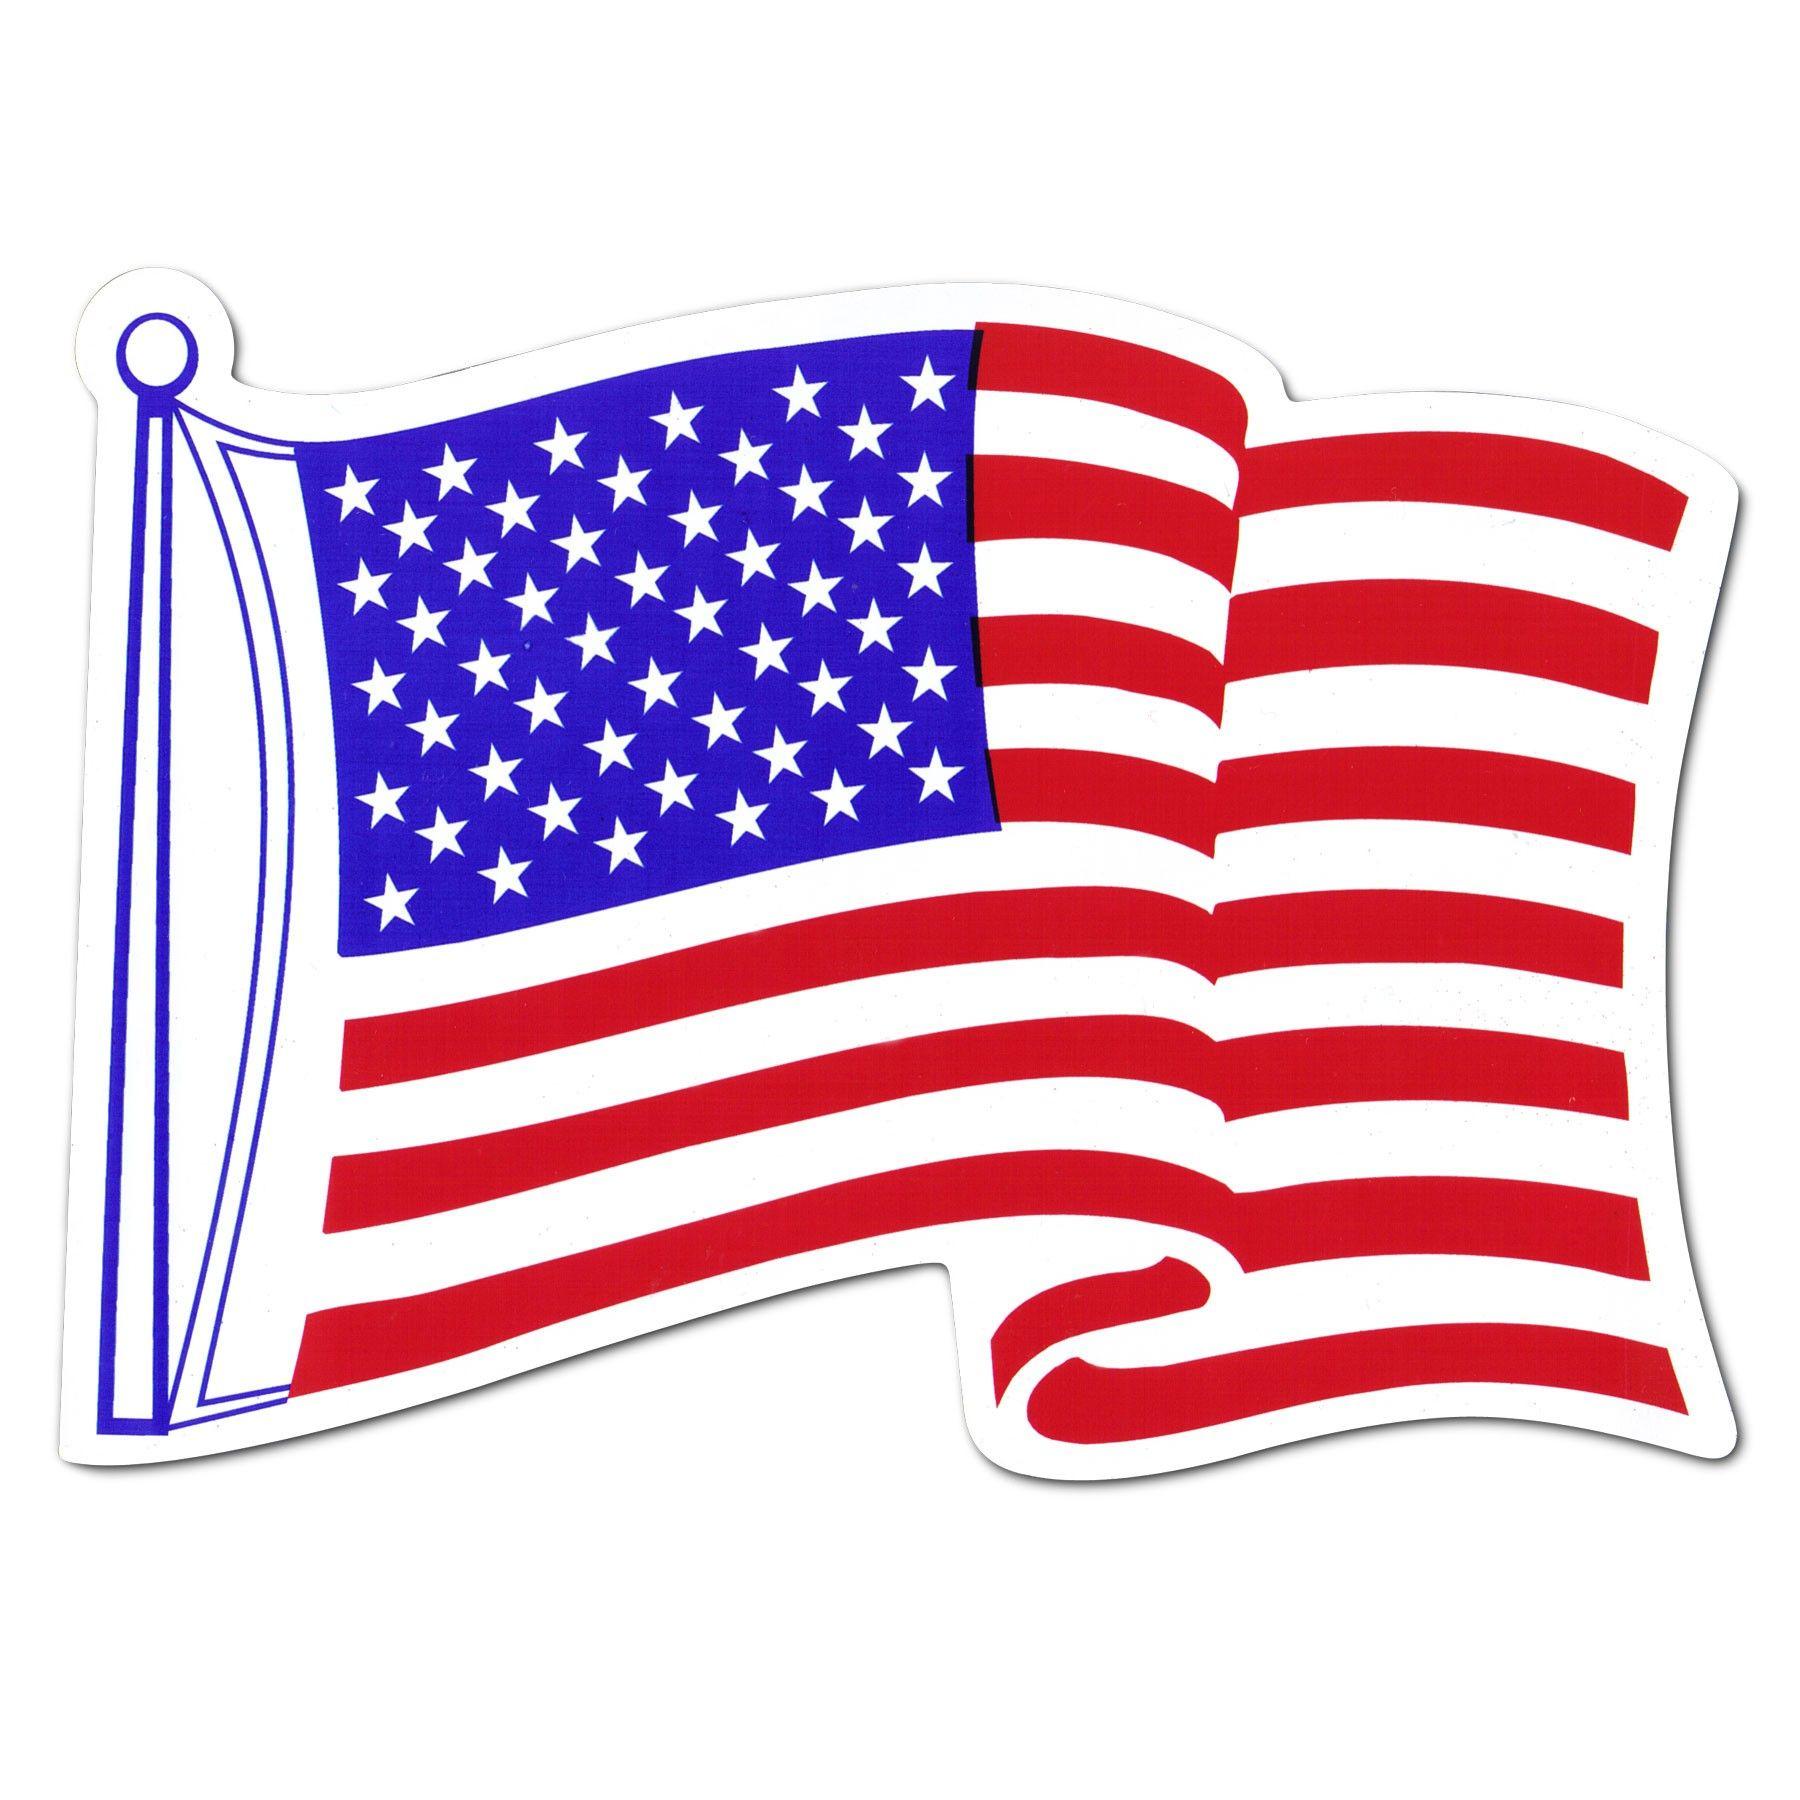 American Car Flag Magnet American Flag Clip Art American Flag Waving American Flag Sticker